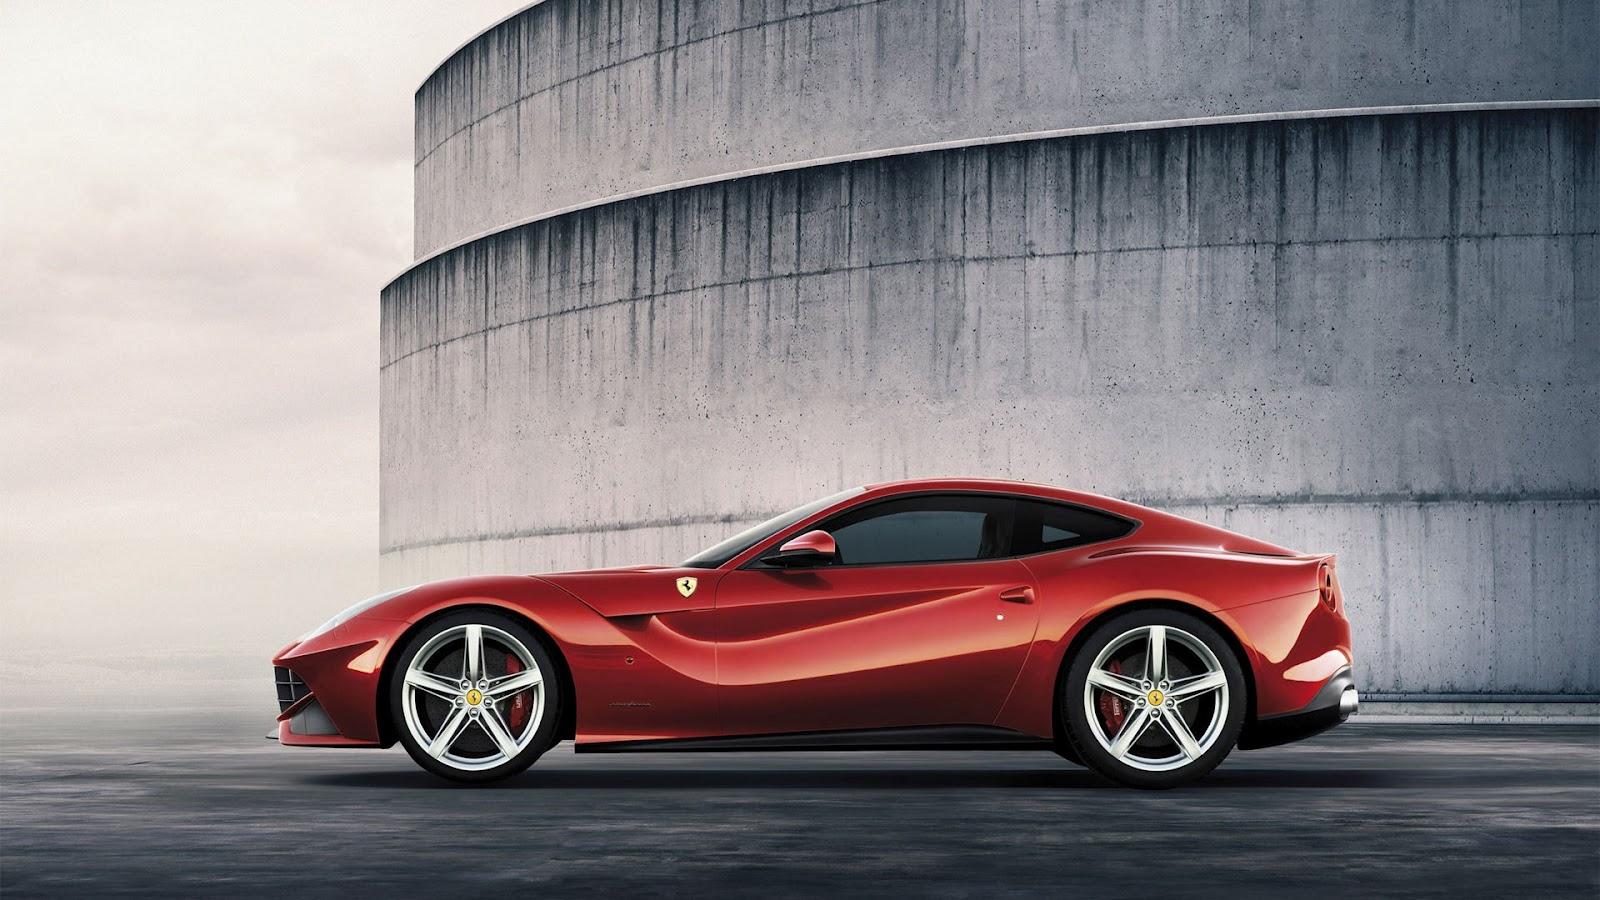 http://2.bp.blogspot.com/-w0UluhHVokY/T6yw3AHMSsI/AAAAAAAAAuI/mjD_edbvCRM/s1600/Ferrari+F12berlinetta+03.jpg